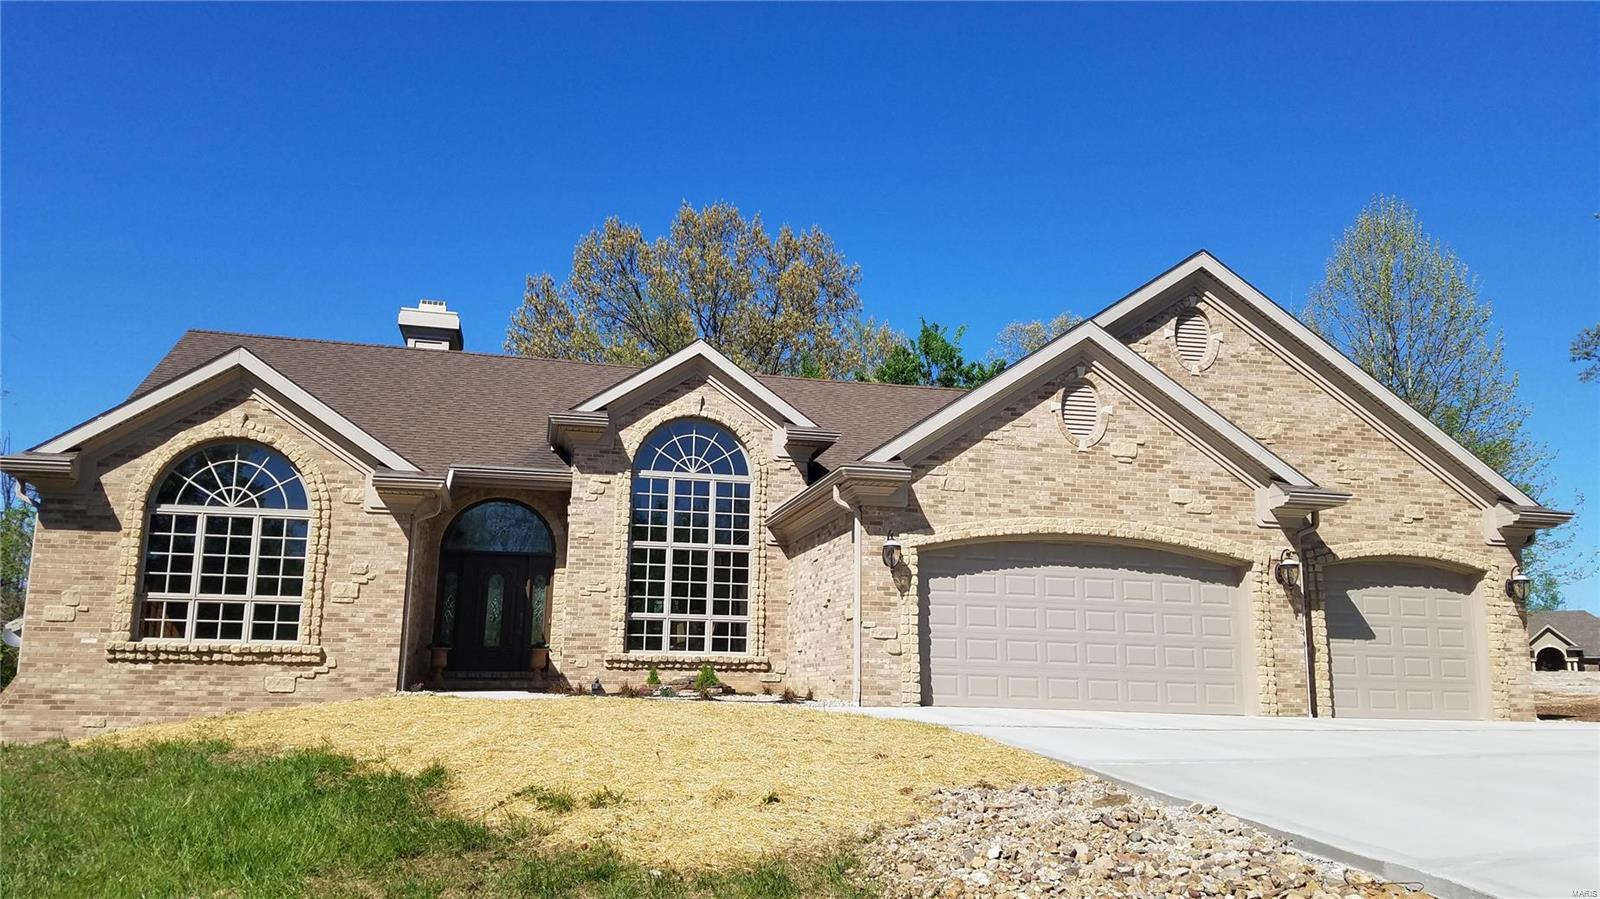 6012 Tara Ct Property Photo - Collinsville, IL real estate listing